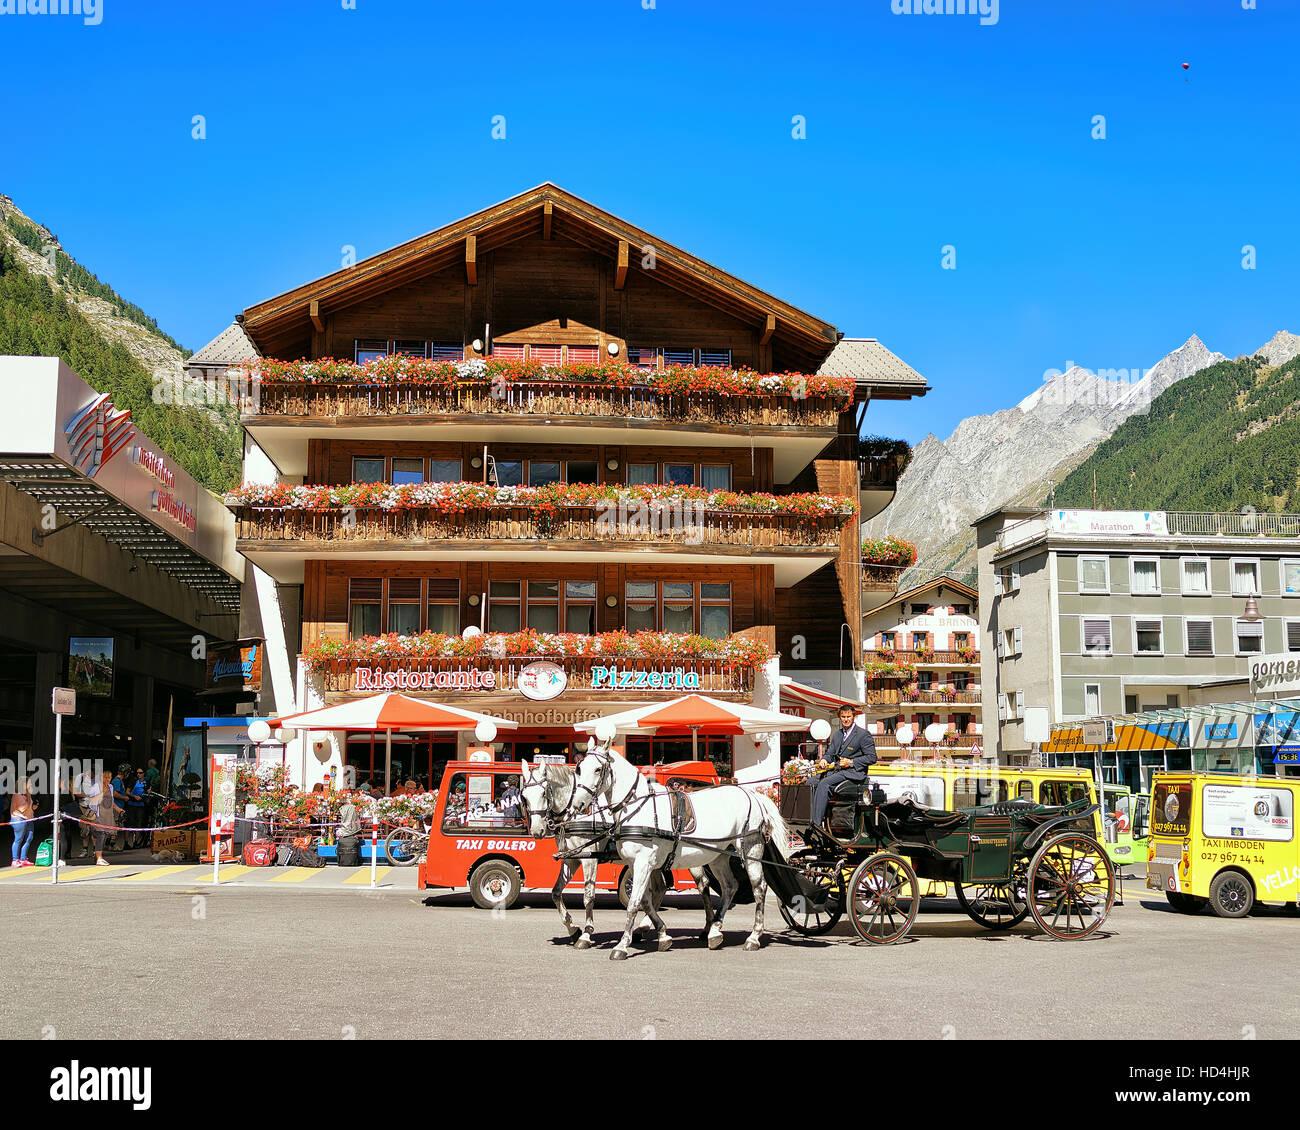 Zermatt, Switzerland - August 24, 2016: Horse vehicle and tourists at City center, Zermatt, Valais canton in Switzerland Stock Photo